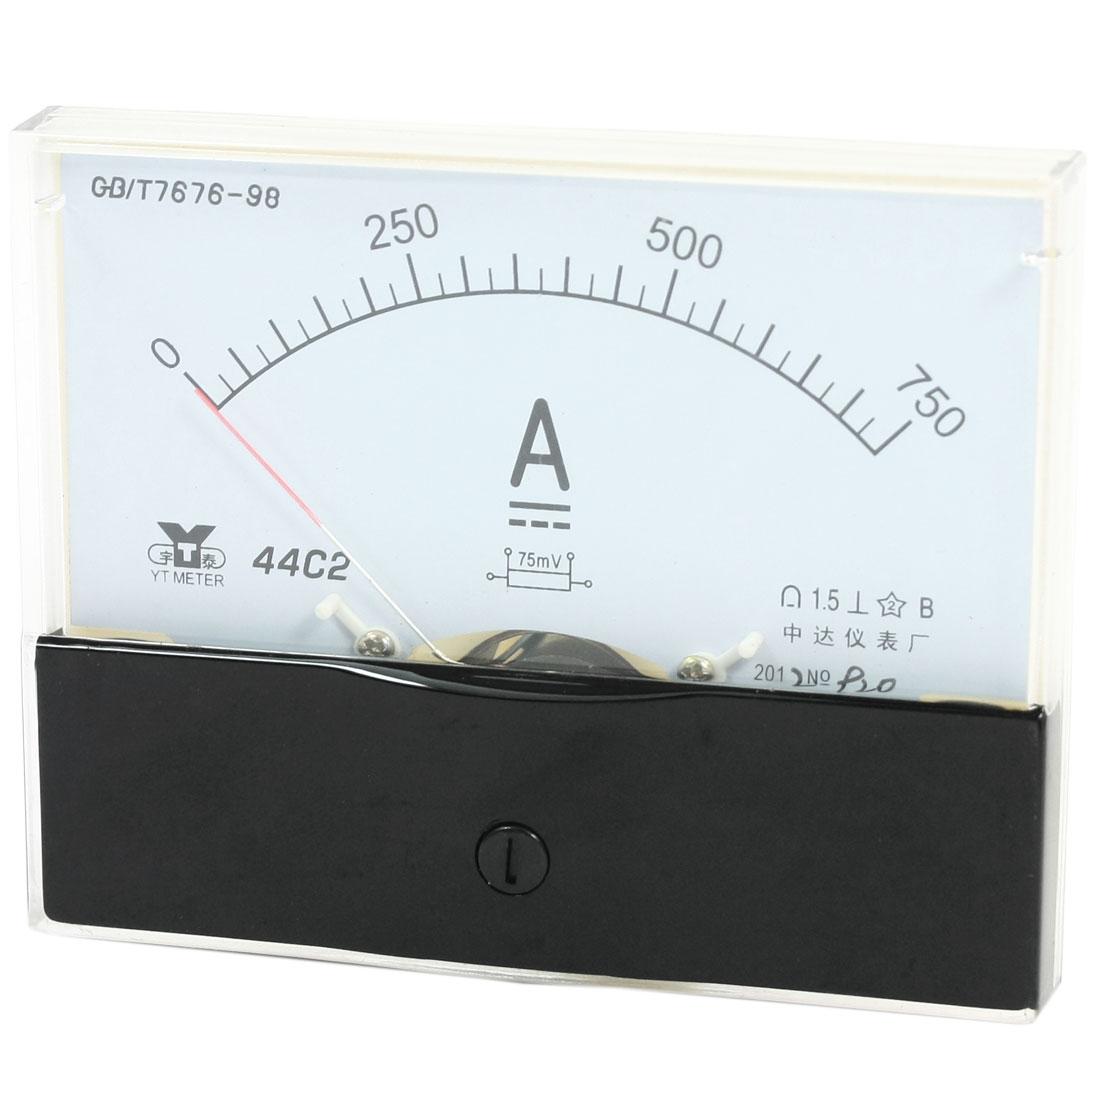 Rectangle Measurement Tool Analog Panel Ammeter Gauge DC 0 - 750A Measuring Range 44C2